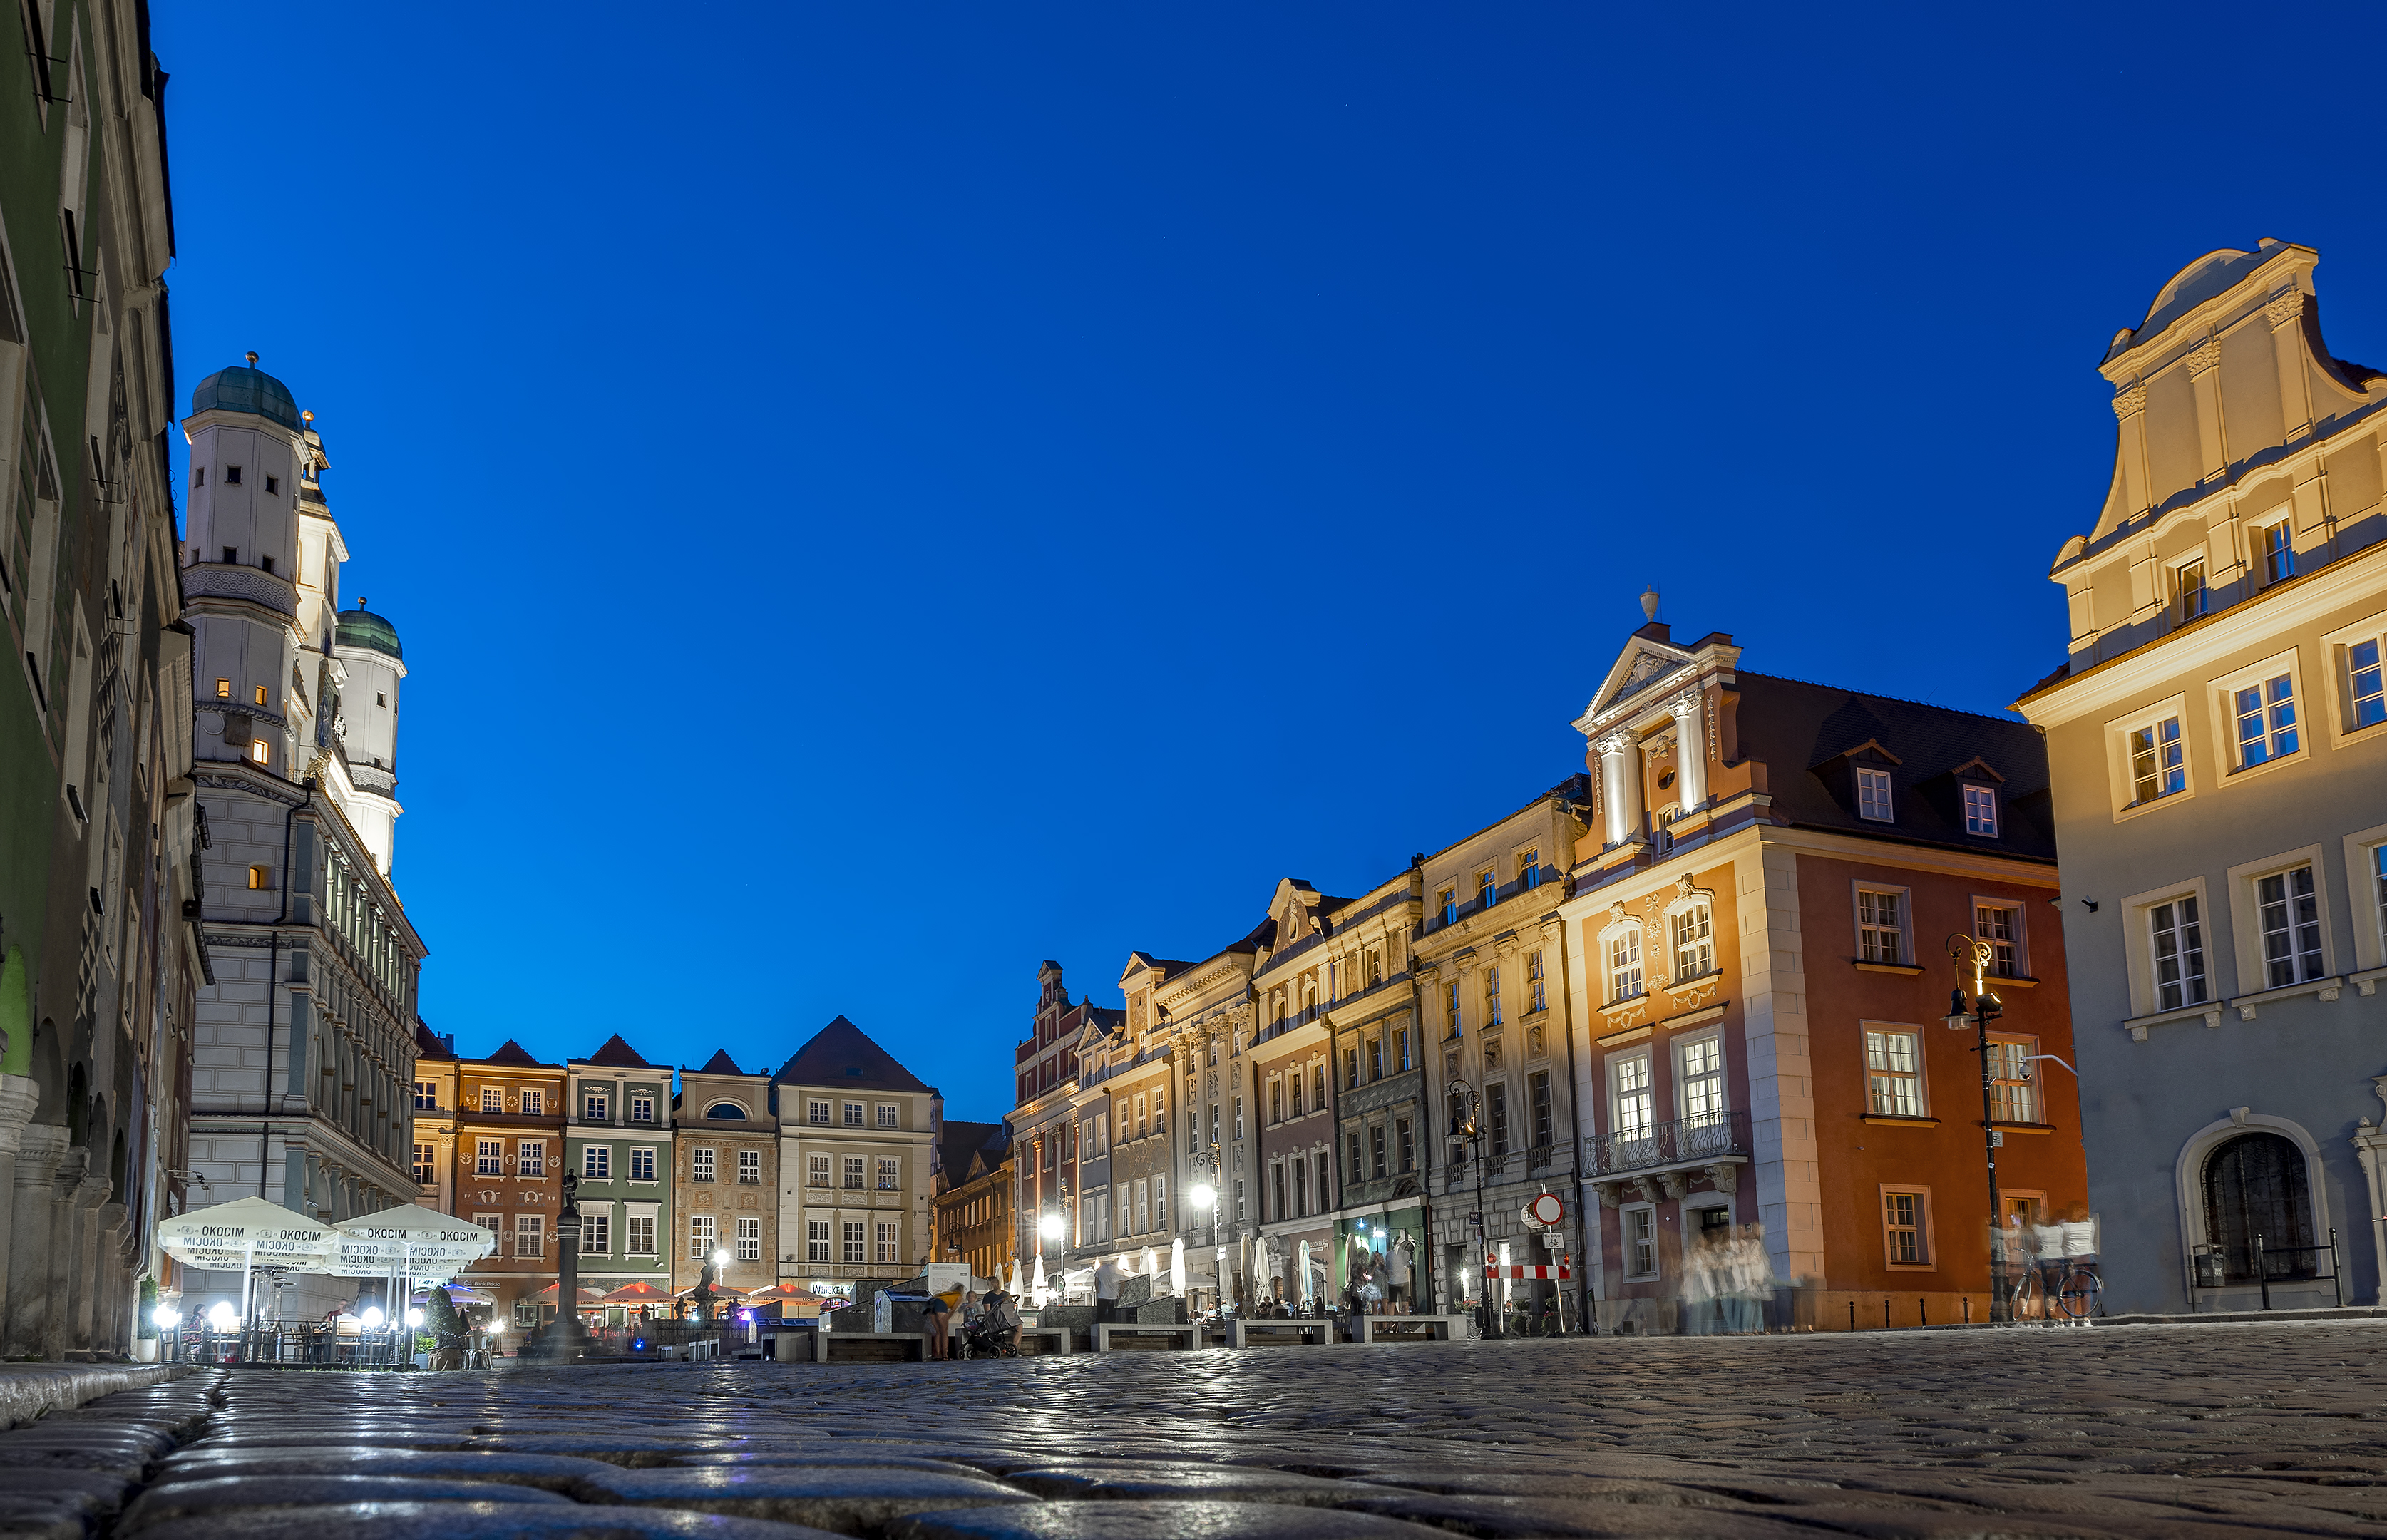 poznan poland old town square